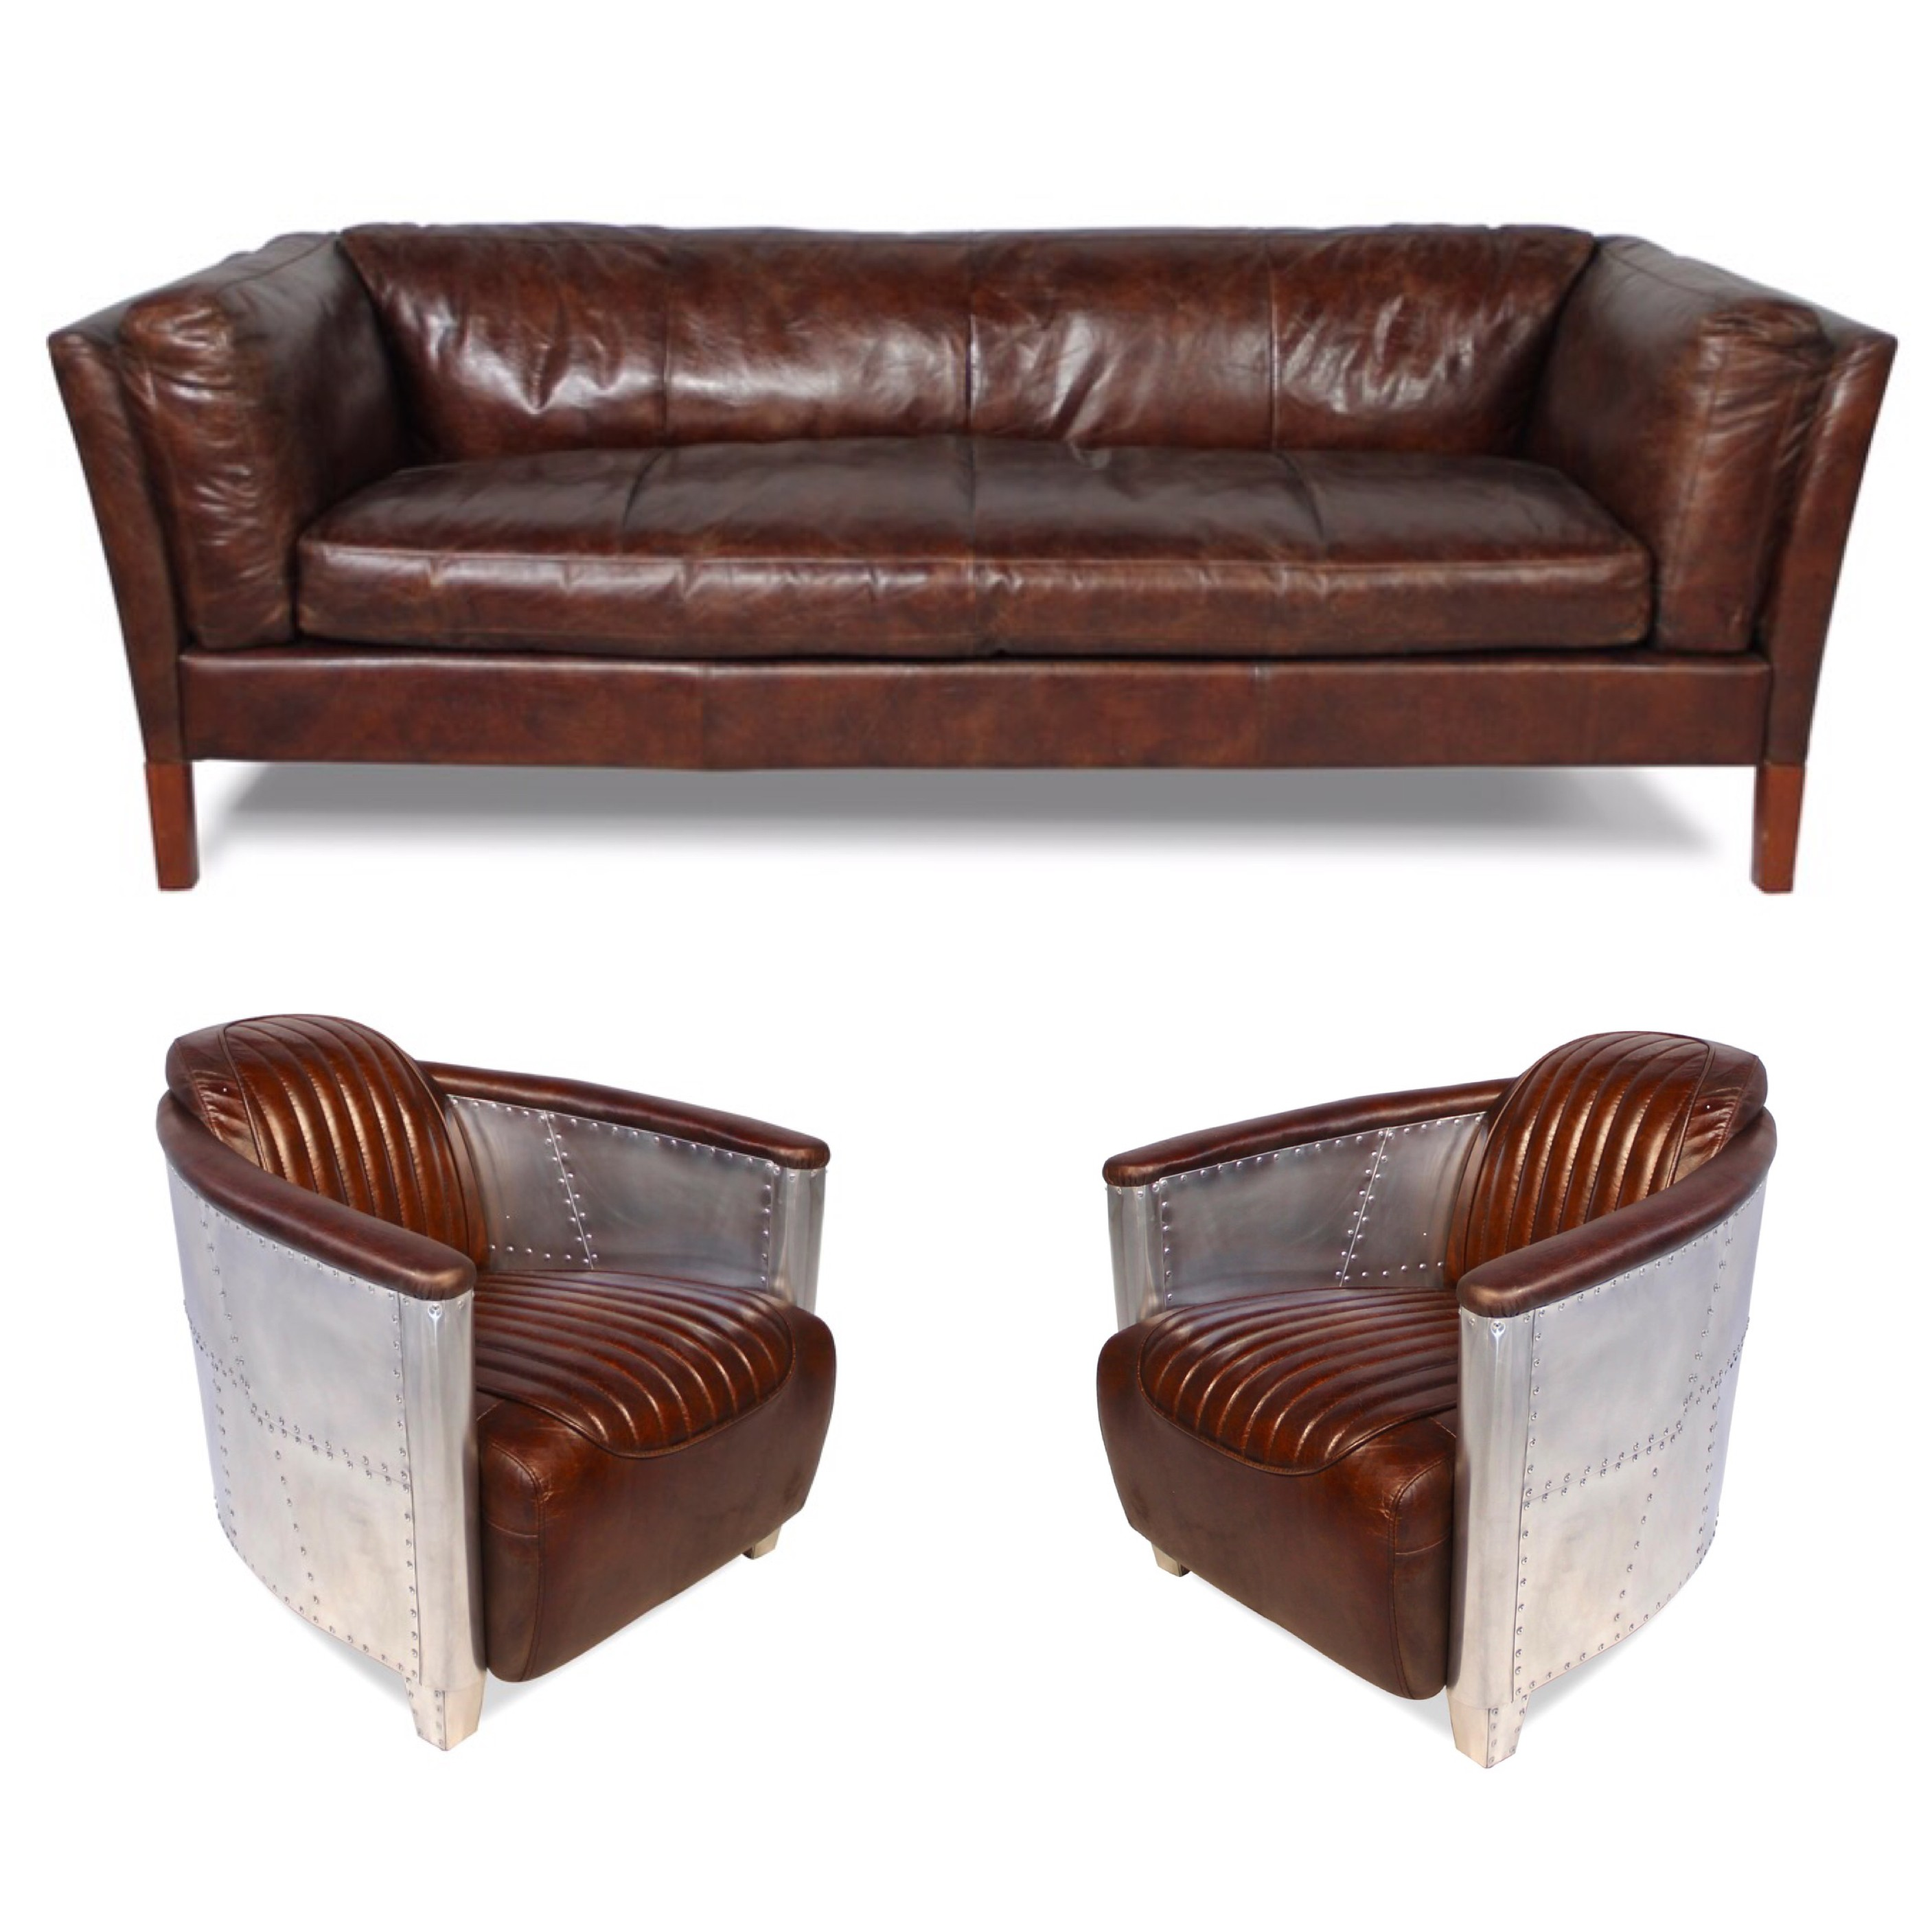 patina braun leder sofa mit zwei vintage braun leder